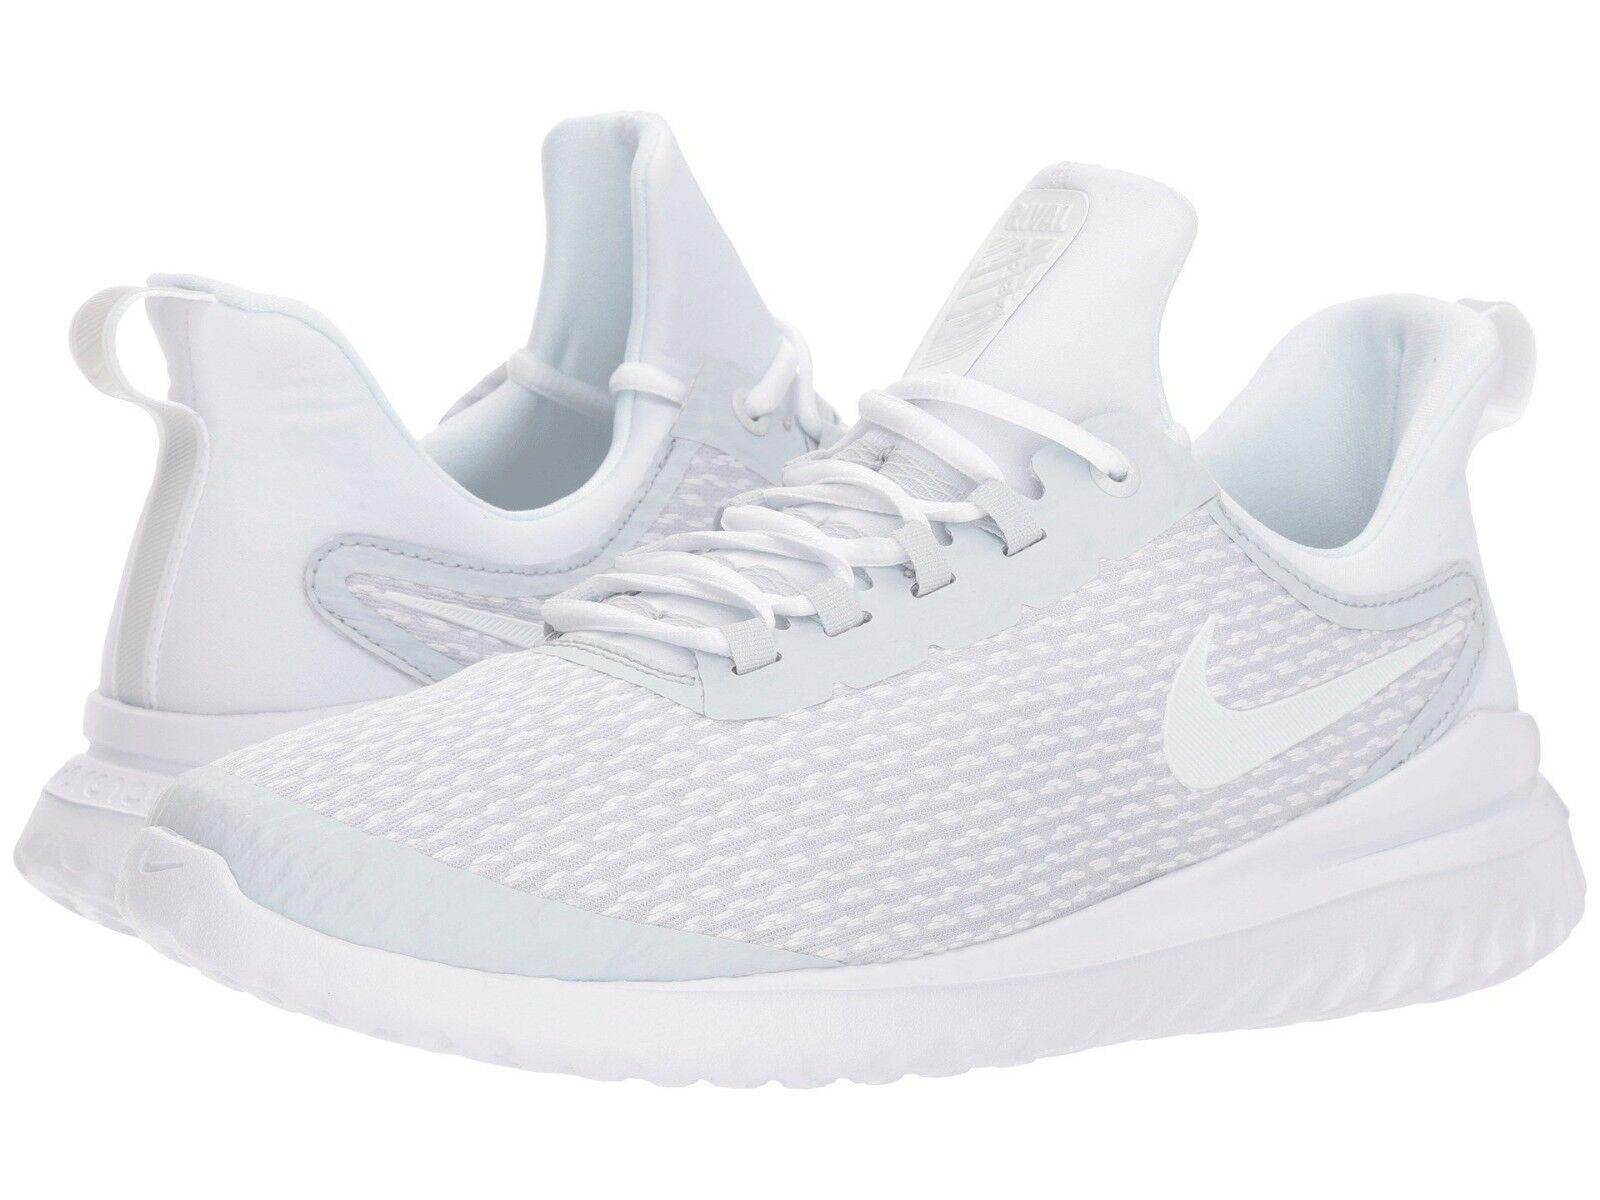 AA7400-010 Hommes Nike Renew Rival Running Pure Platinum/blanc Szs 8-13 NIB